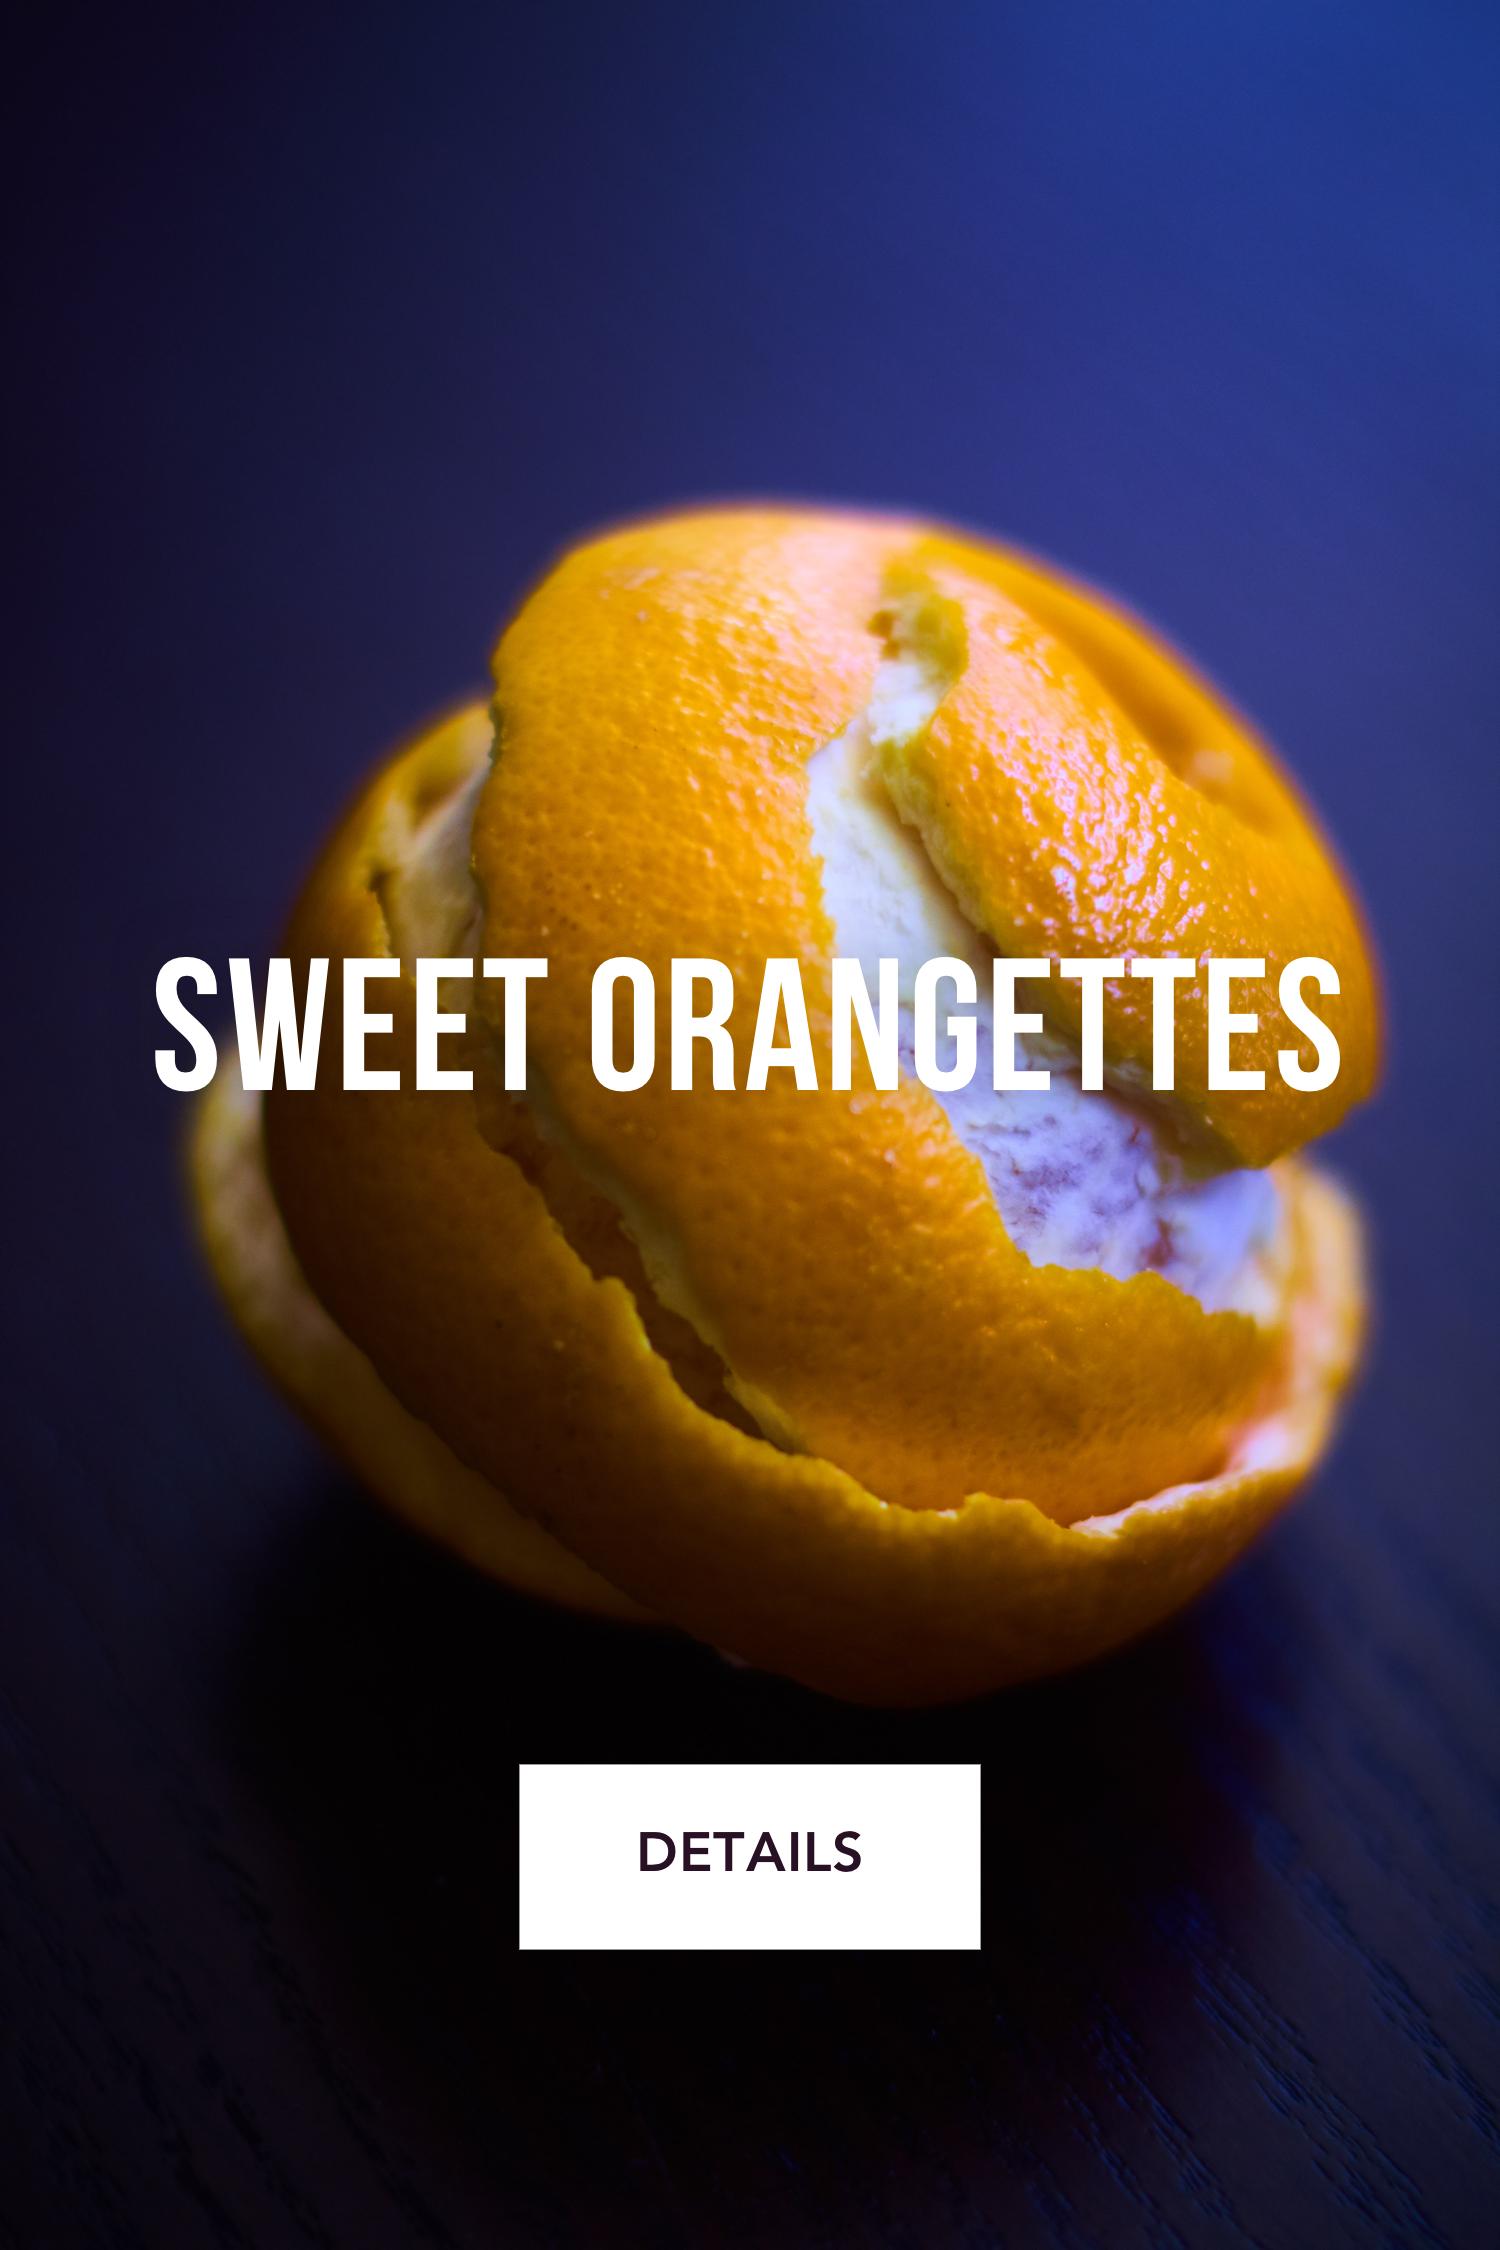 Sweet Orangettes